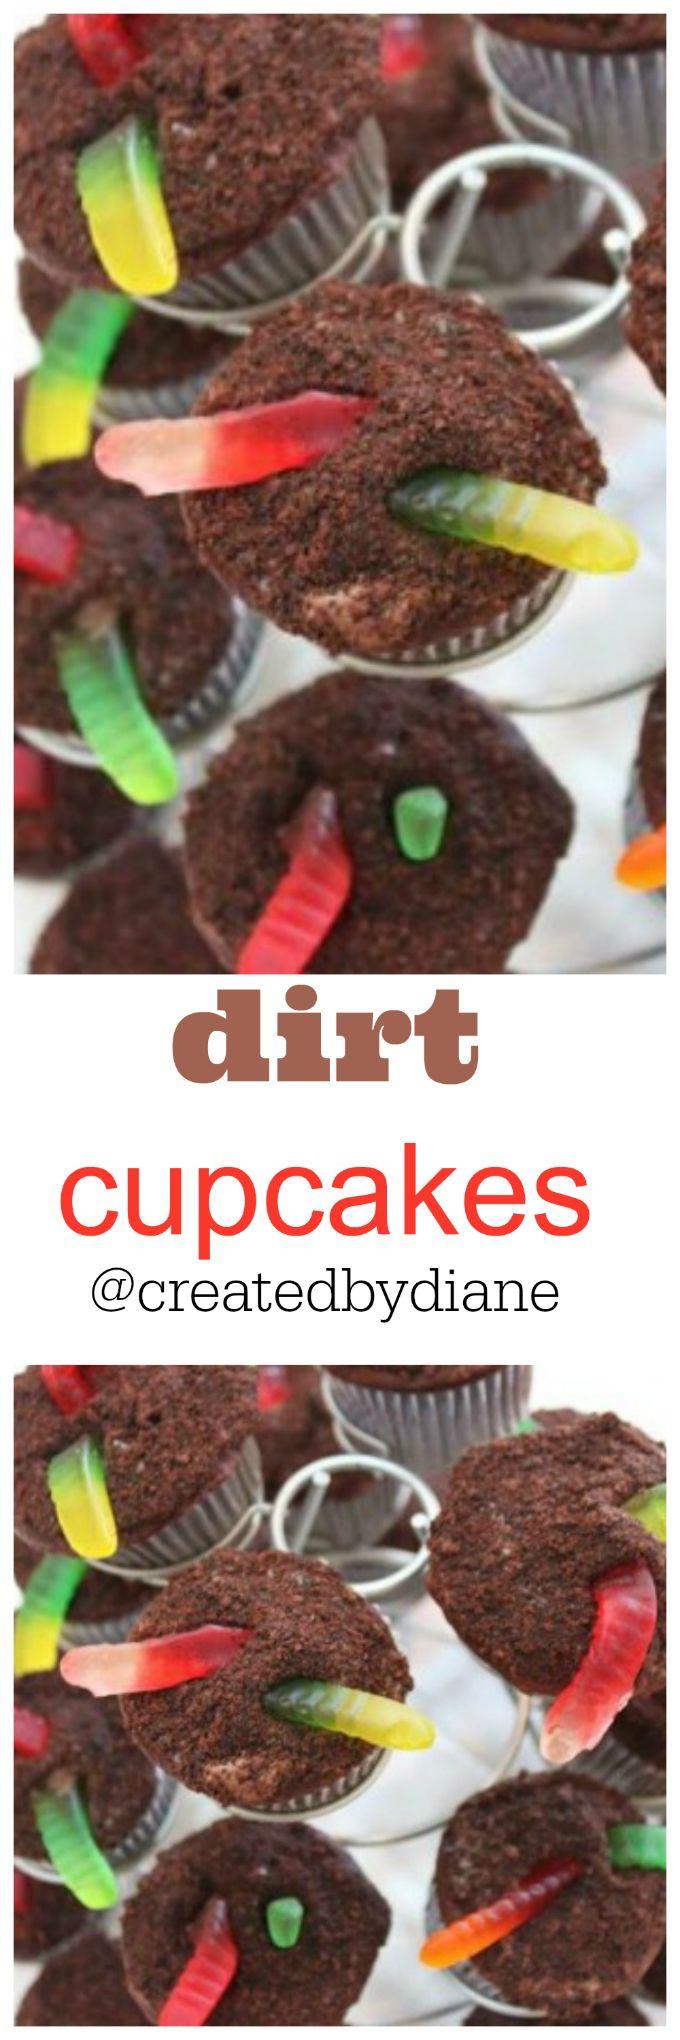 dirt cupcakes @createdbydiane